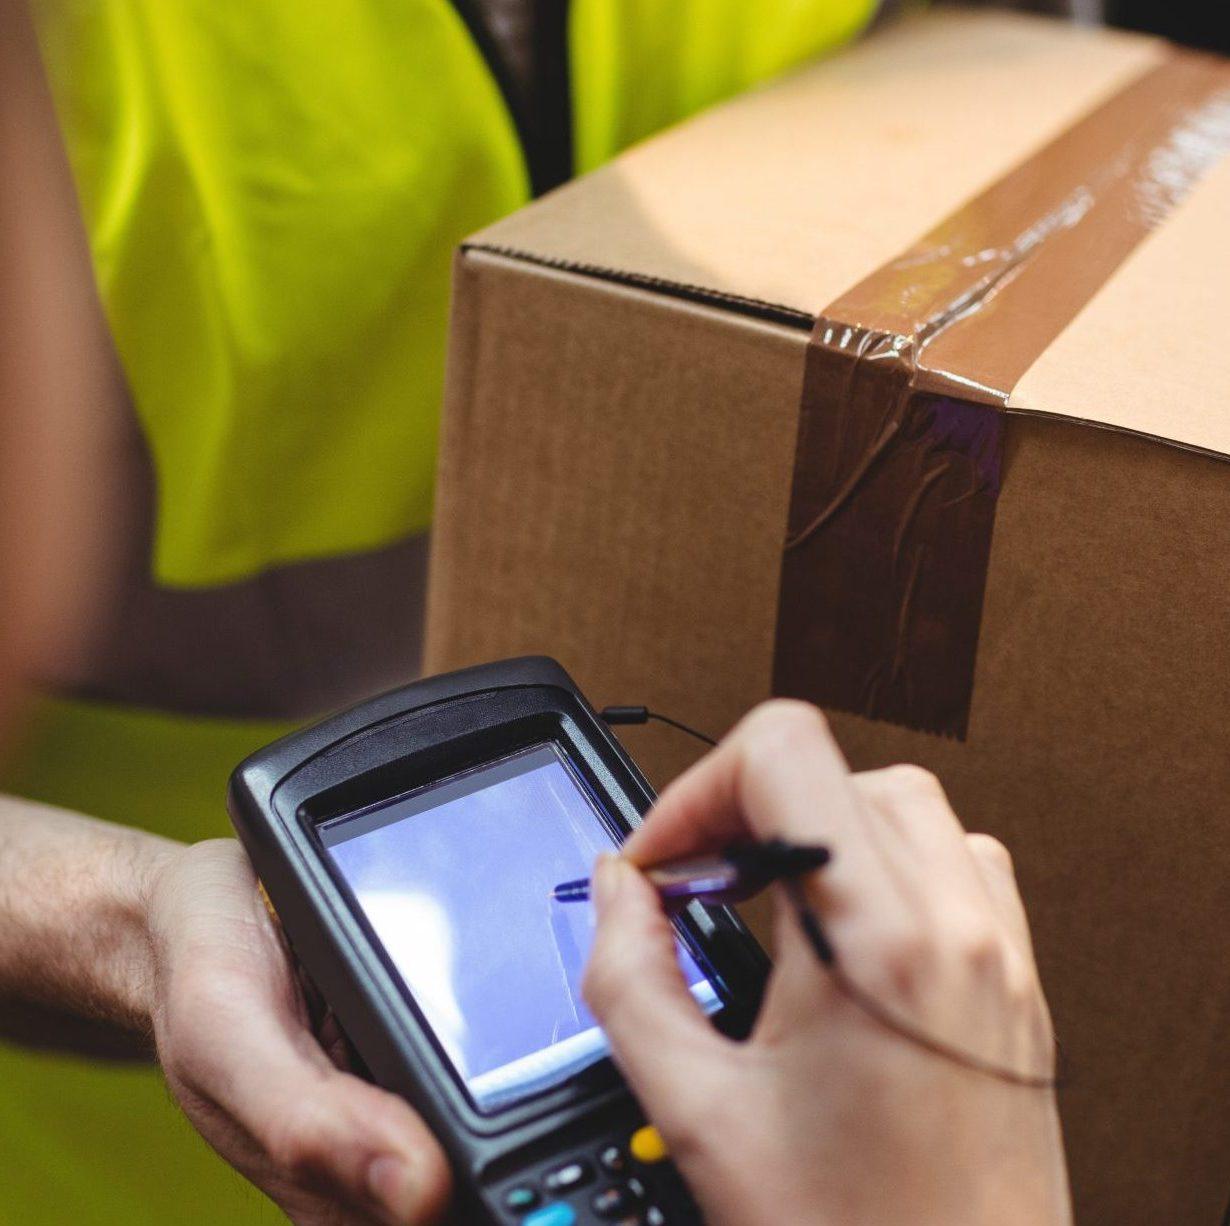 Smart despatch software